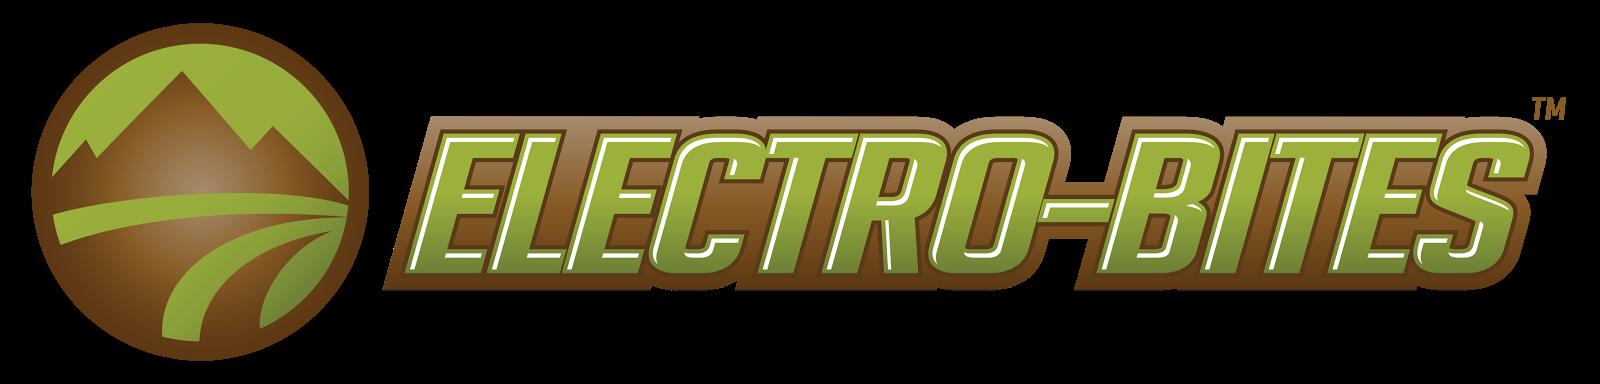 http://electro-bites.com/